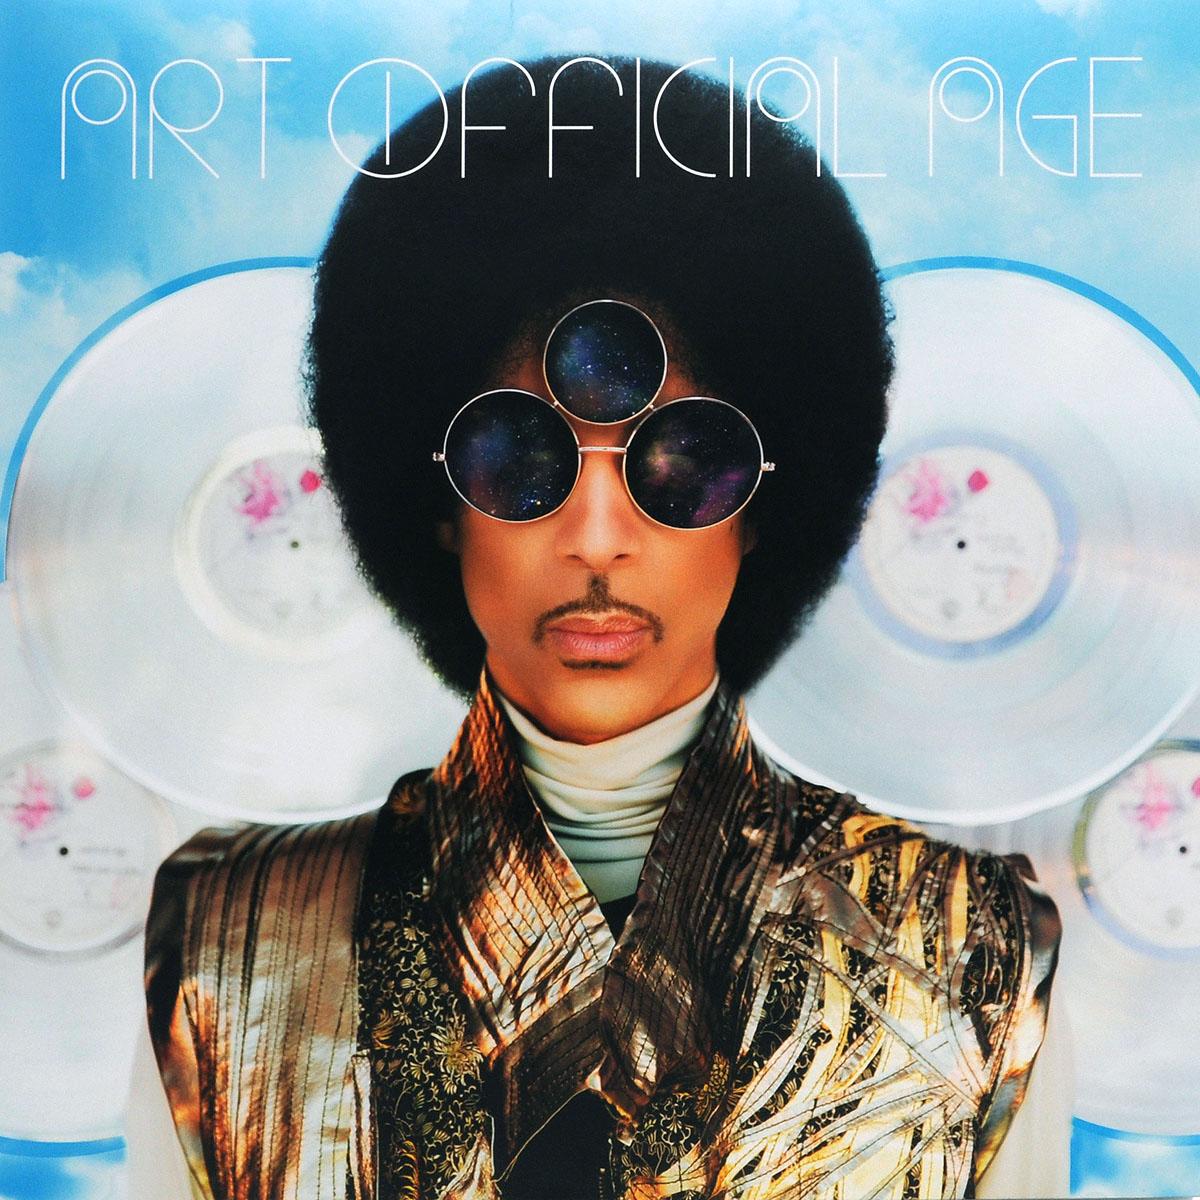 LP 1:Tracks 1 - 3LP 2:Tracks 4 - 6LP 3:Tracks 7 - 10LP 4:Tracks 11 - 13